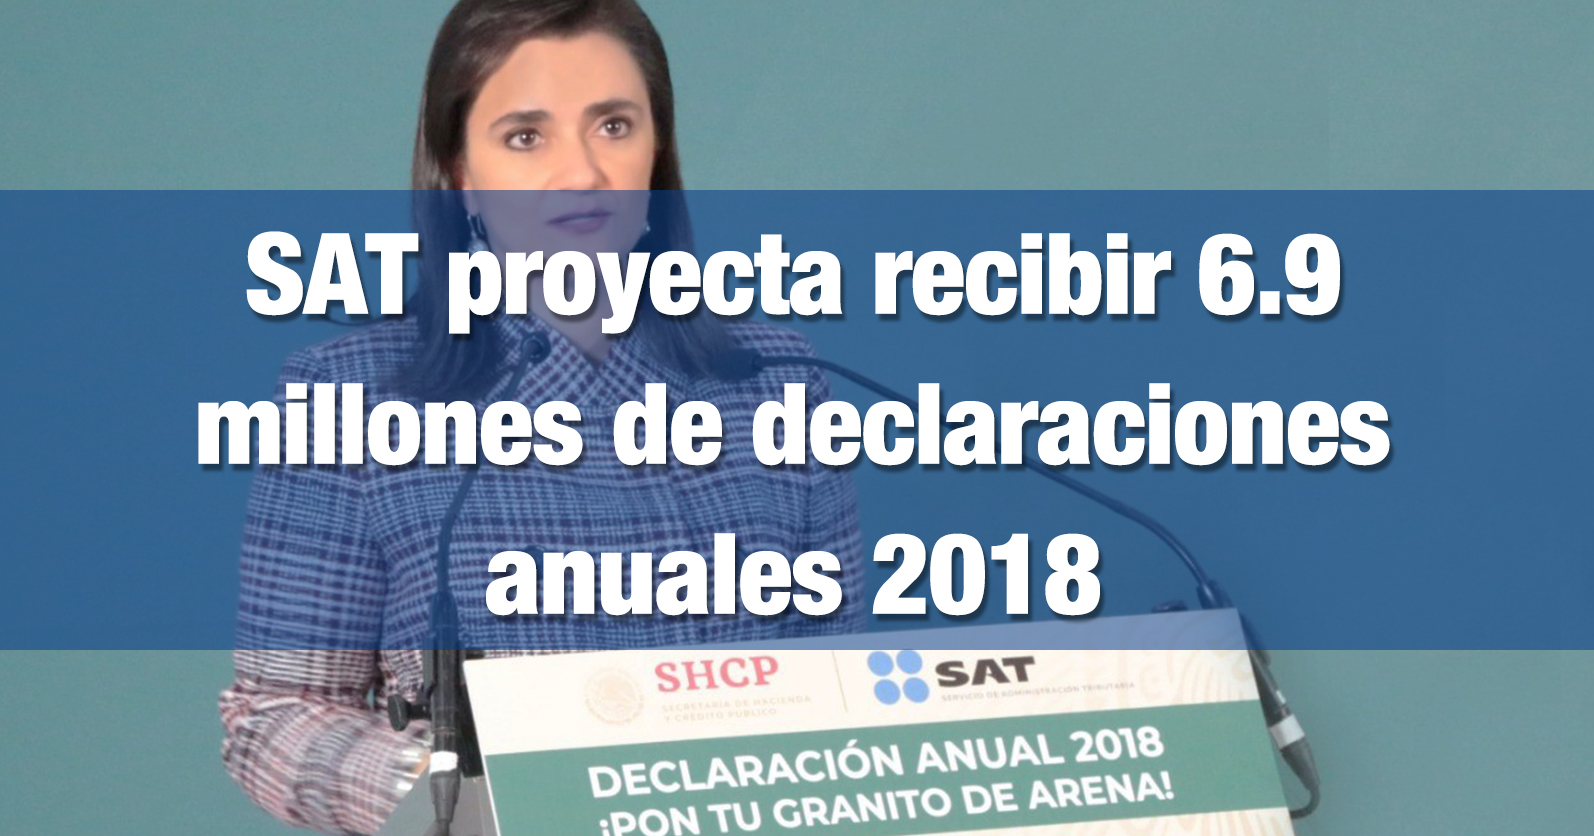 SAT proyecta recibir 6.9 millones de declaraciones anuales 2018